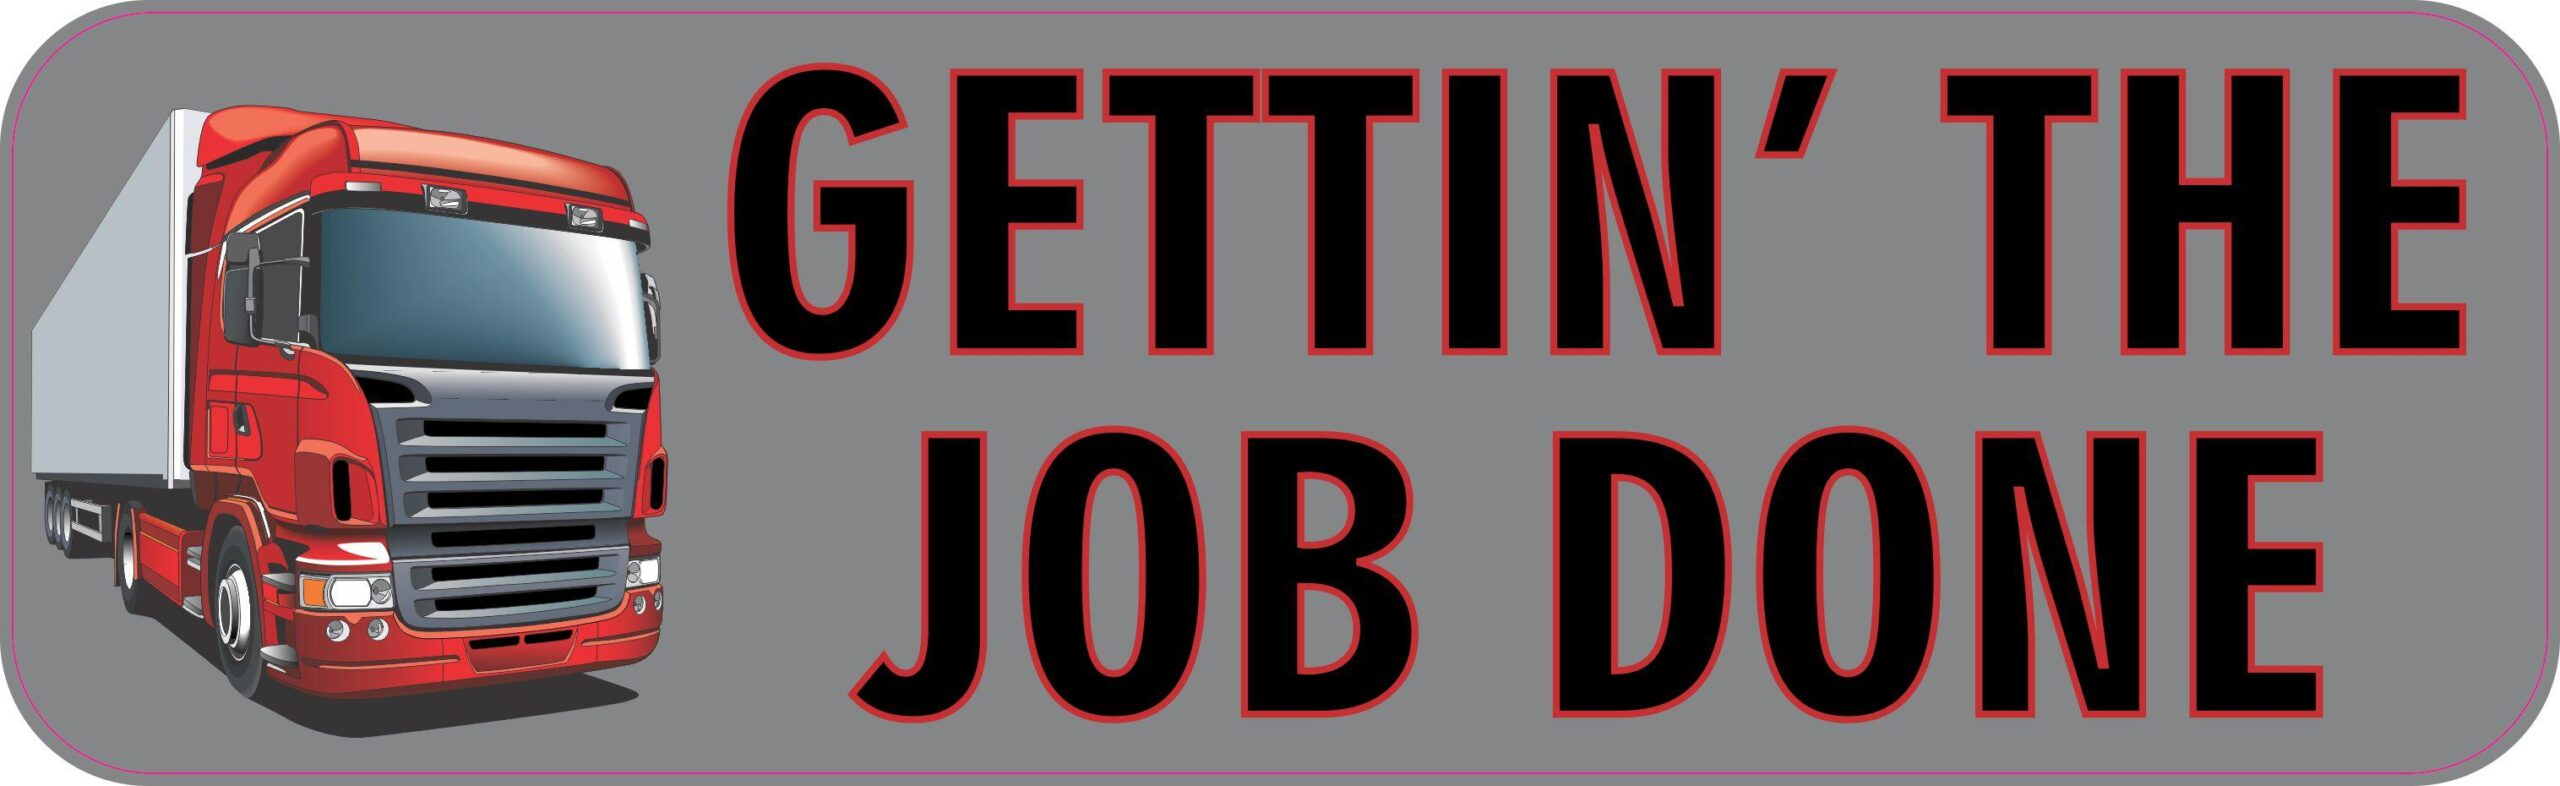 Gettin' the Job Done Bumper Sticker